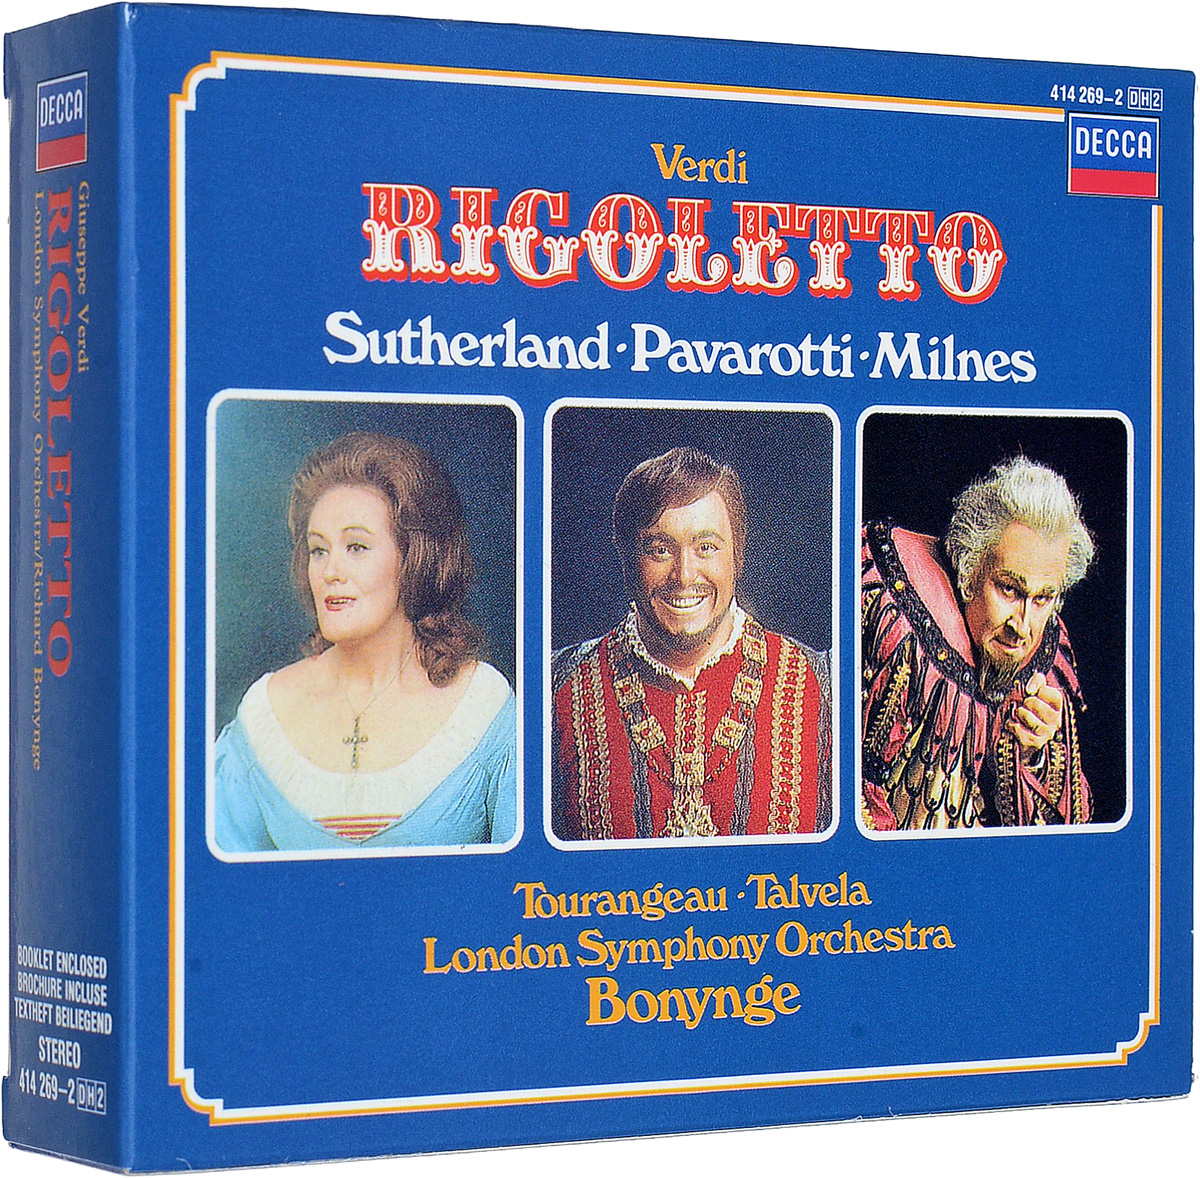 Ричард Бонинг Richard Bonynge. Verdi: Rigoletto (2 CD) ричард томпсон richard thompson live at the bbc 3 cd dvd